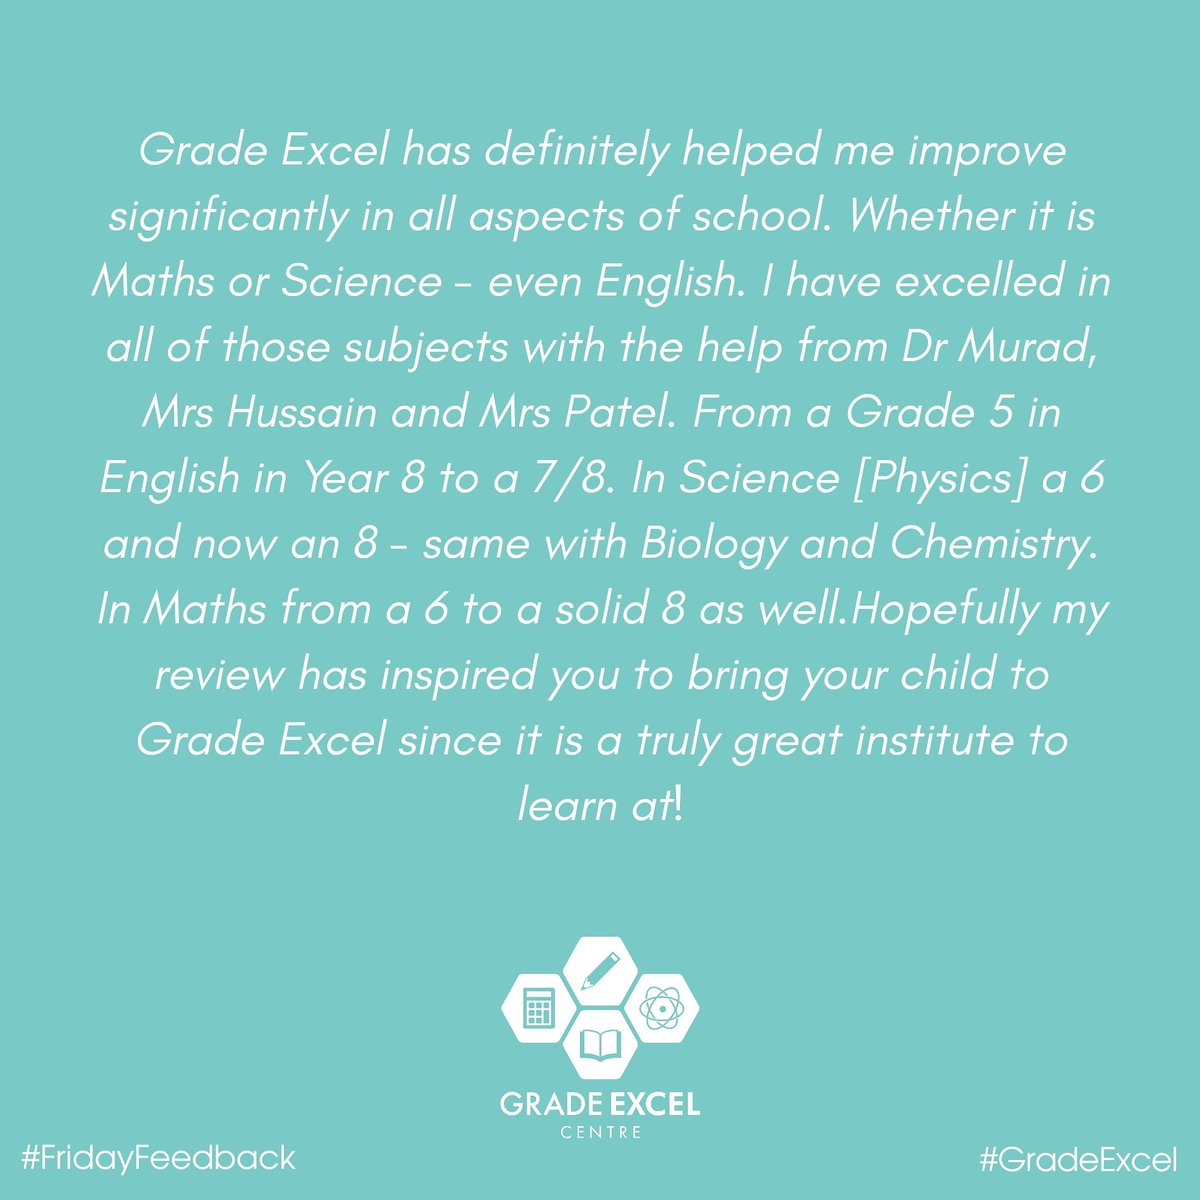 #FridayFeedback #ParentFeedback #StudentFeedback #WhatOthersSay #GradeExcel #Education #AcceleratedLearning #Makingadifference #KS2 #KS3 #GCSE #English #Maths #Science #QualifiedTeachersOnly #NoScreenPolicy https://t.co/5gNroyqShW